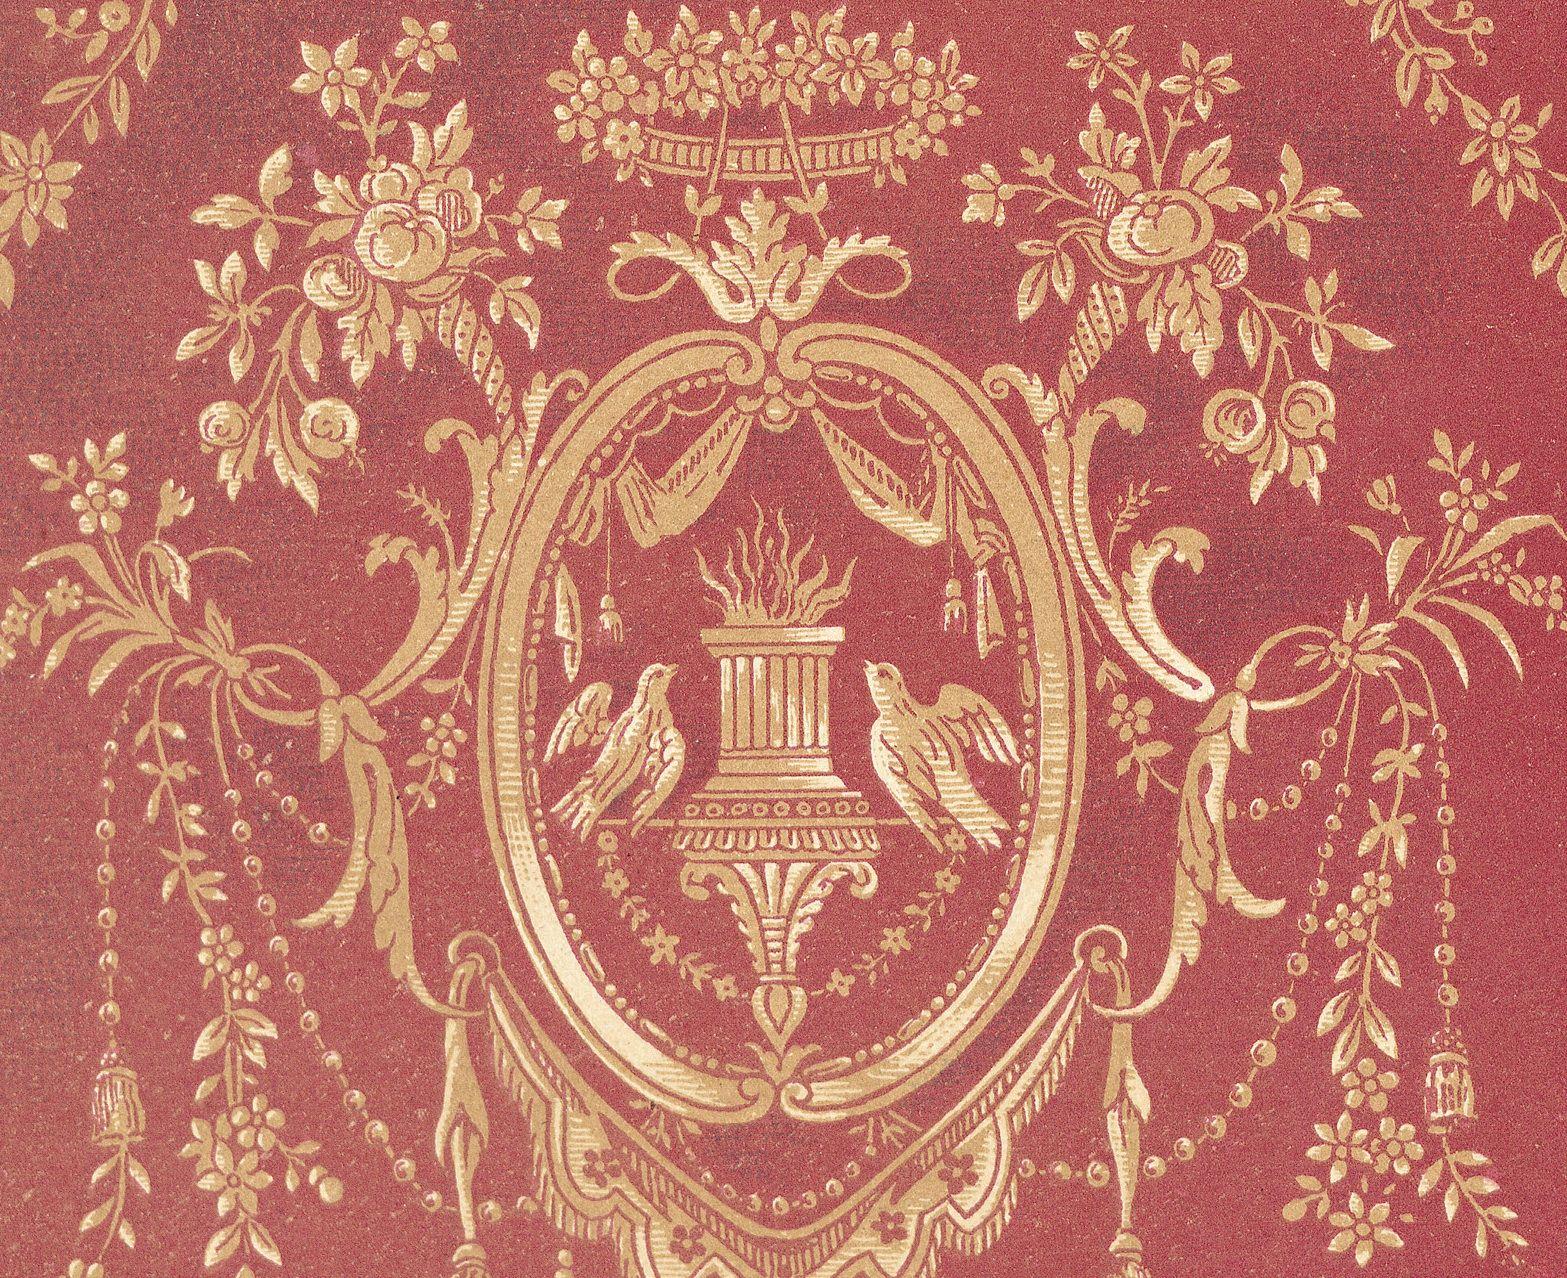 Downton Abbey Wallpaper In 2019 Victorian Wallpaper Room